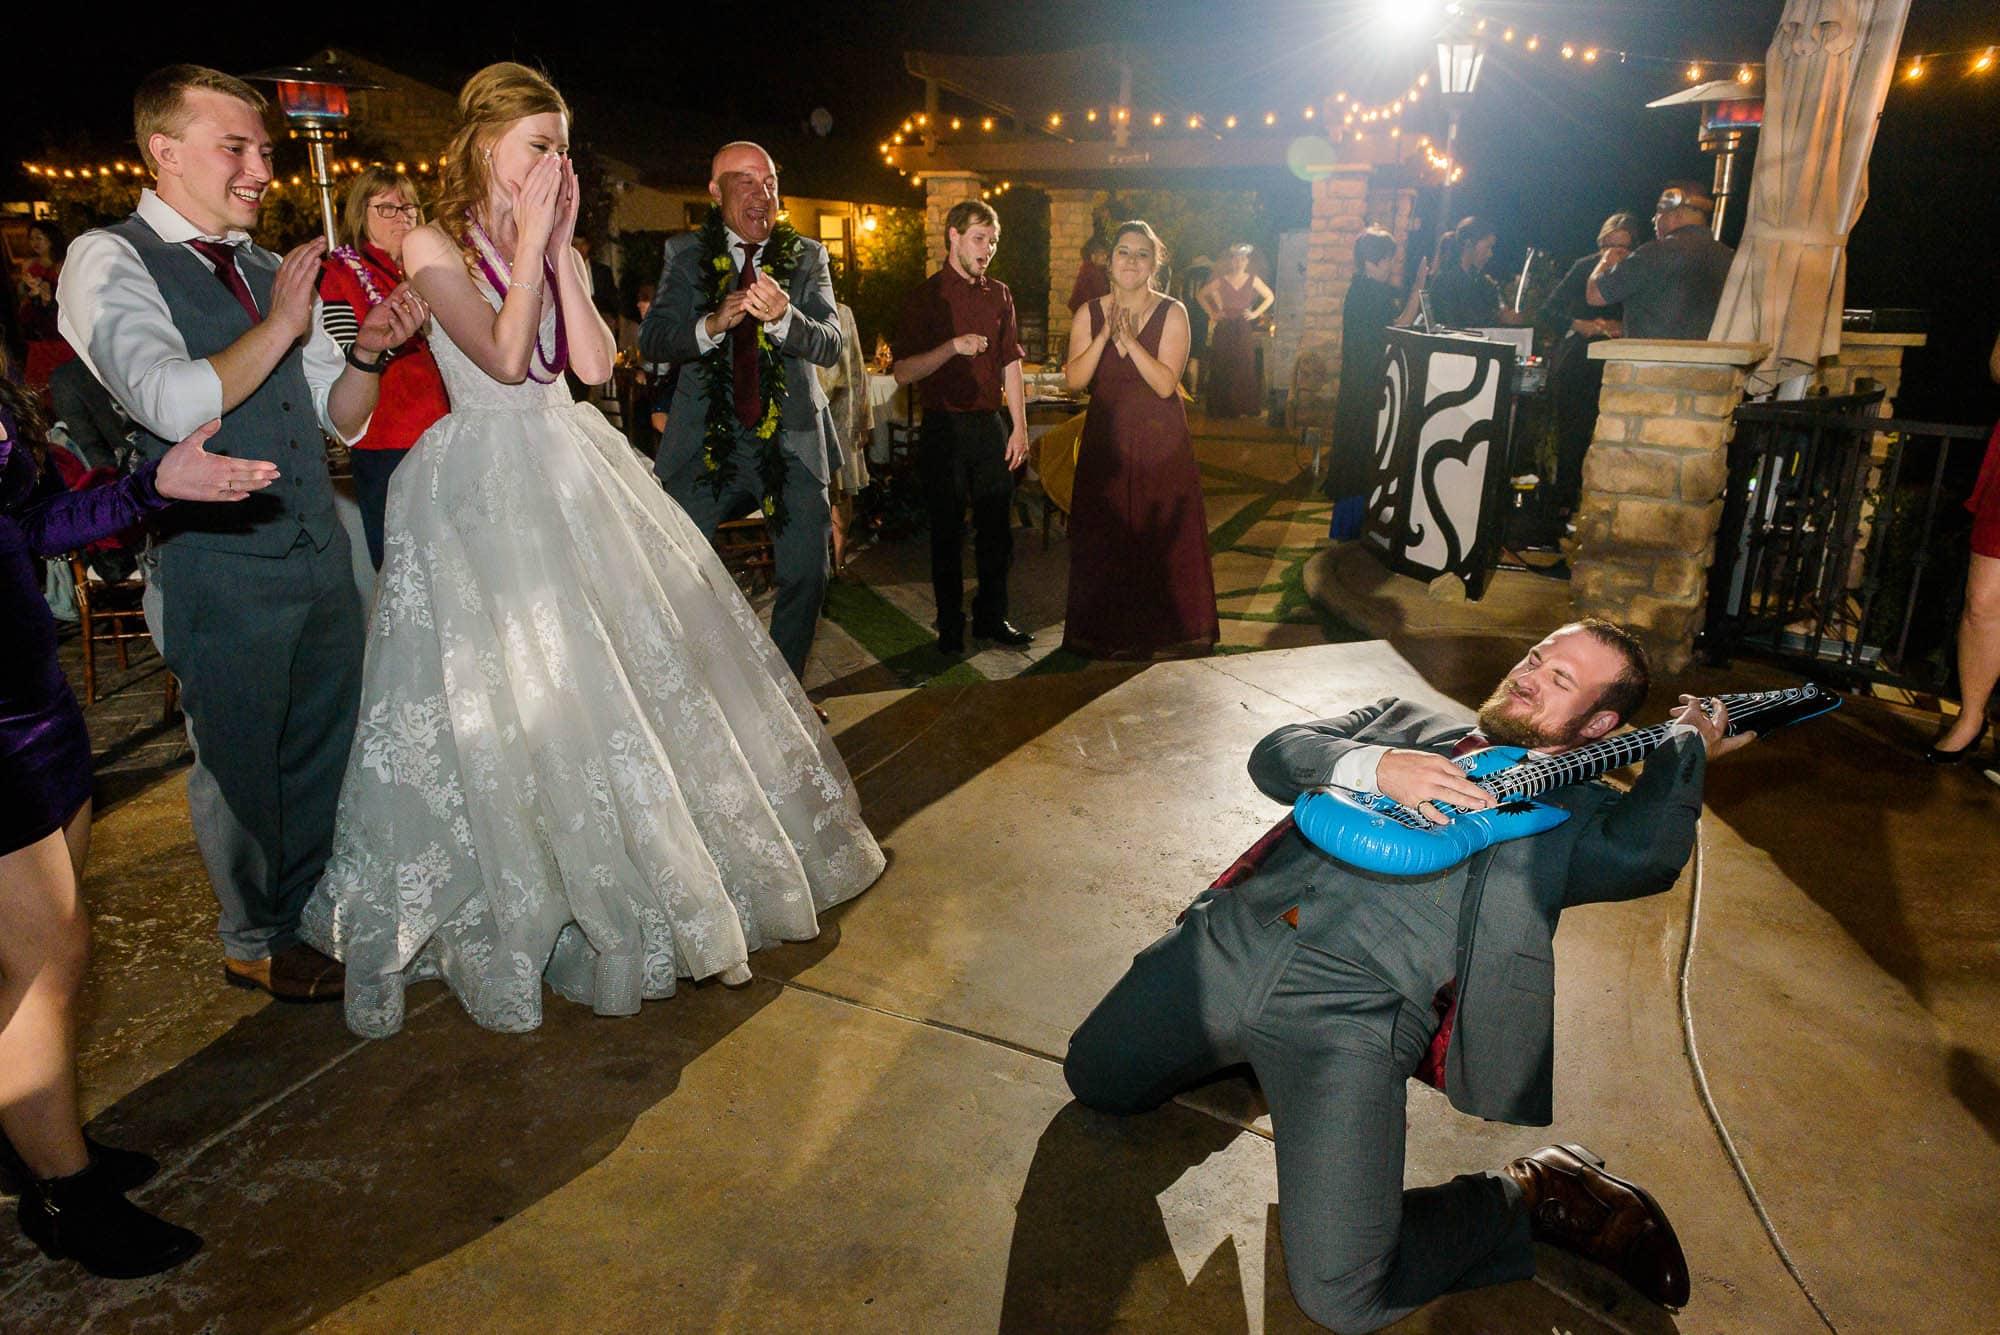 799_Alan_and_Heidi_Serendipity_Garden_Wedding_10-27-2018